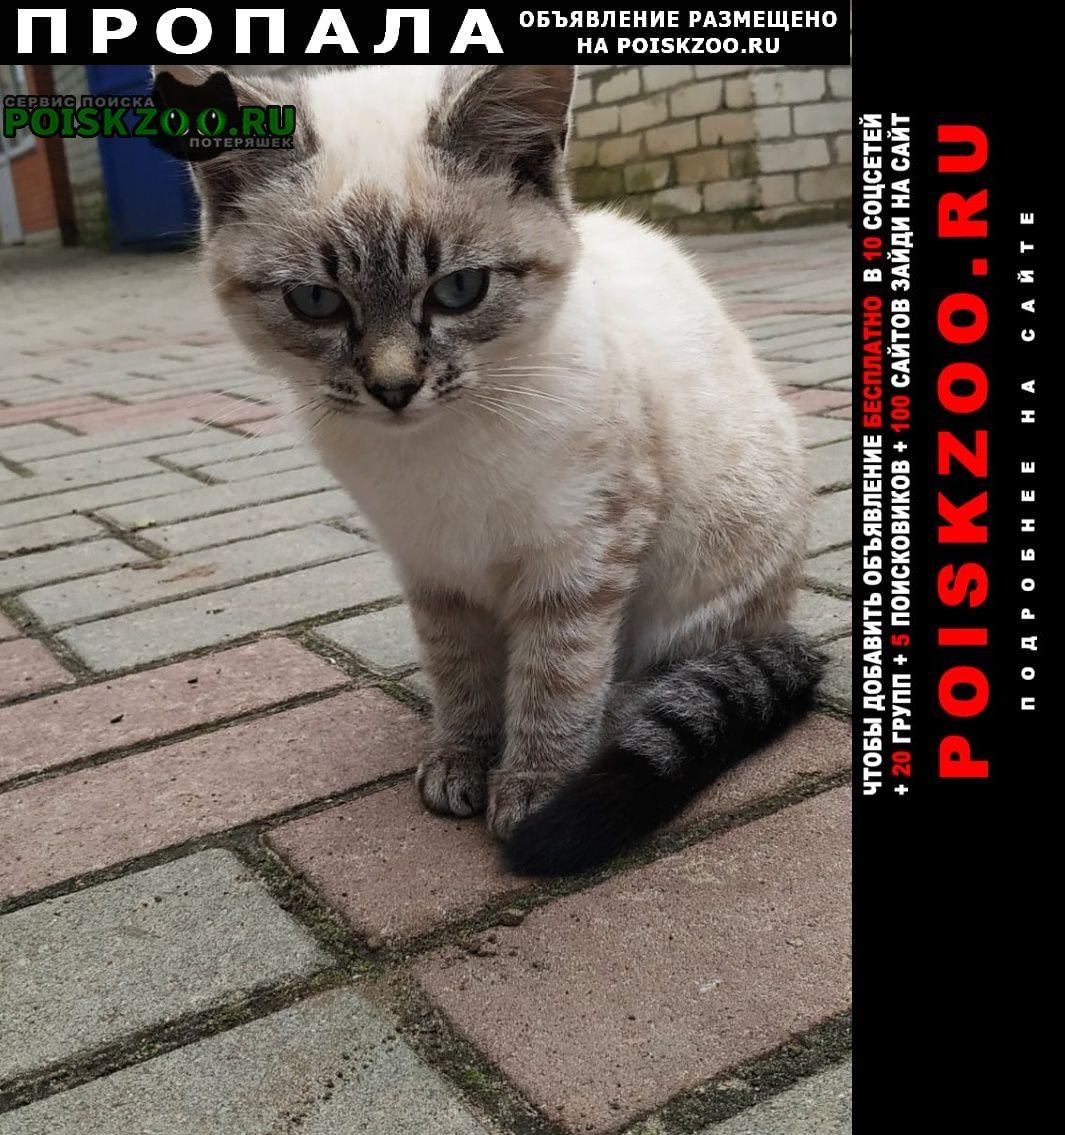 Пропала кошка Клинцы